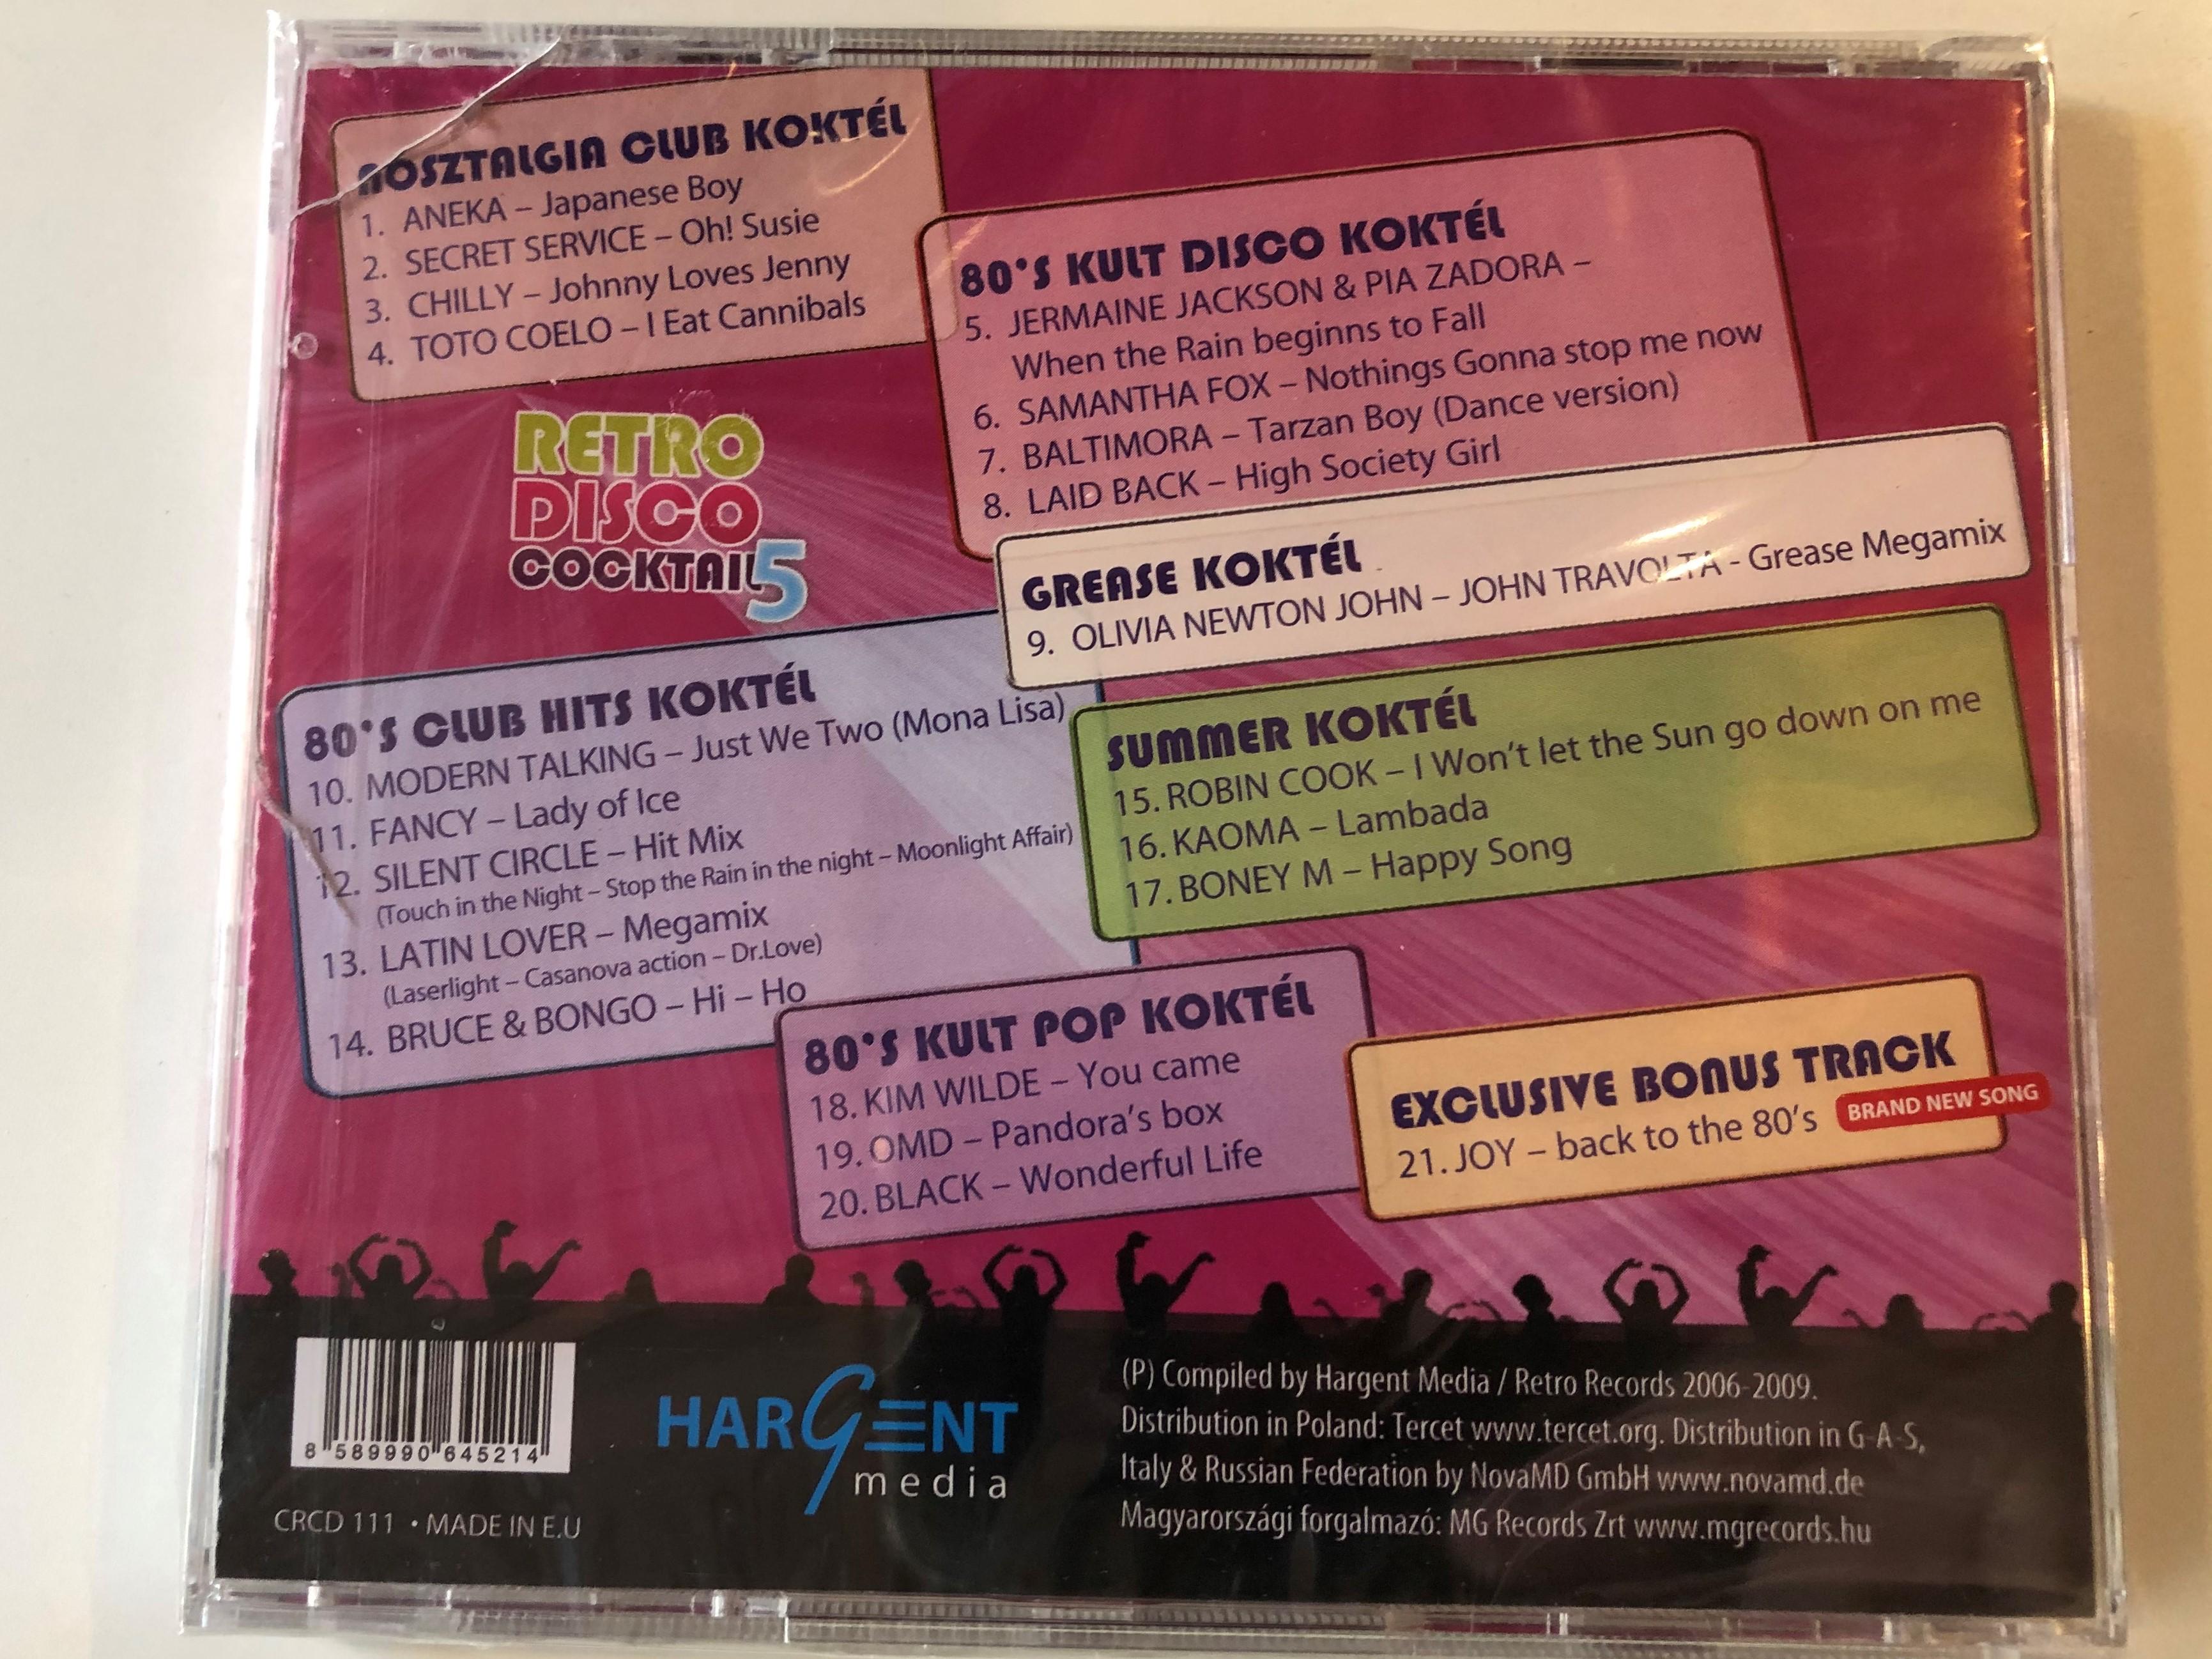 retro-disco-cocktail-5-kim-wilde-chilly-modern-talking-john-travolta-olivia-newton-john-laid-back-aneka-bruce-bongo-boney-m-silent-circle-toto-coelo...-hargent-media-audio-cd-c.jpg